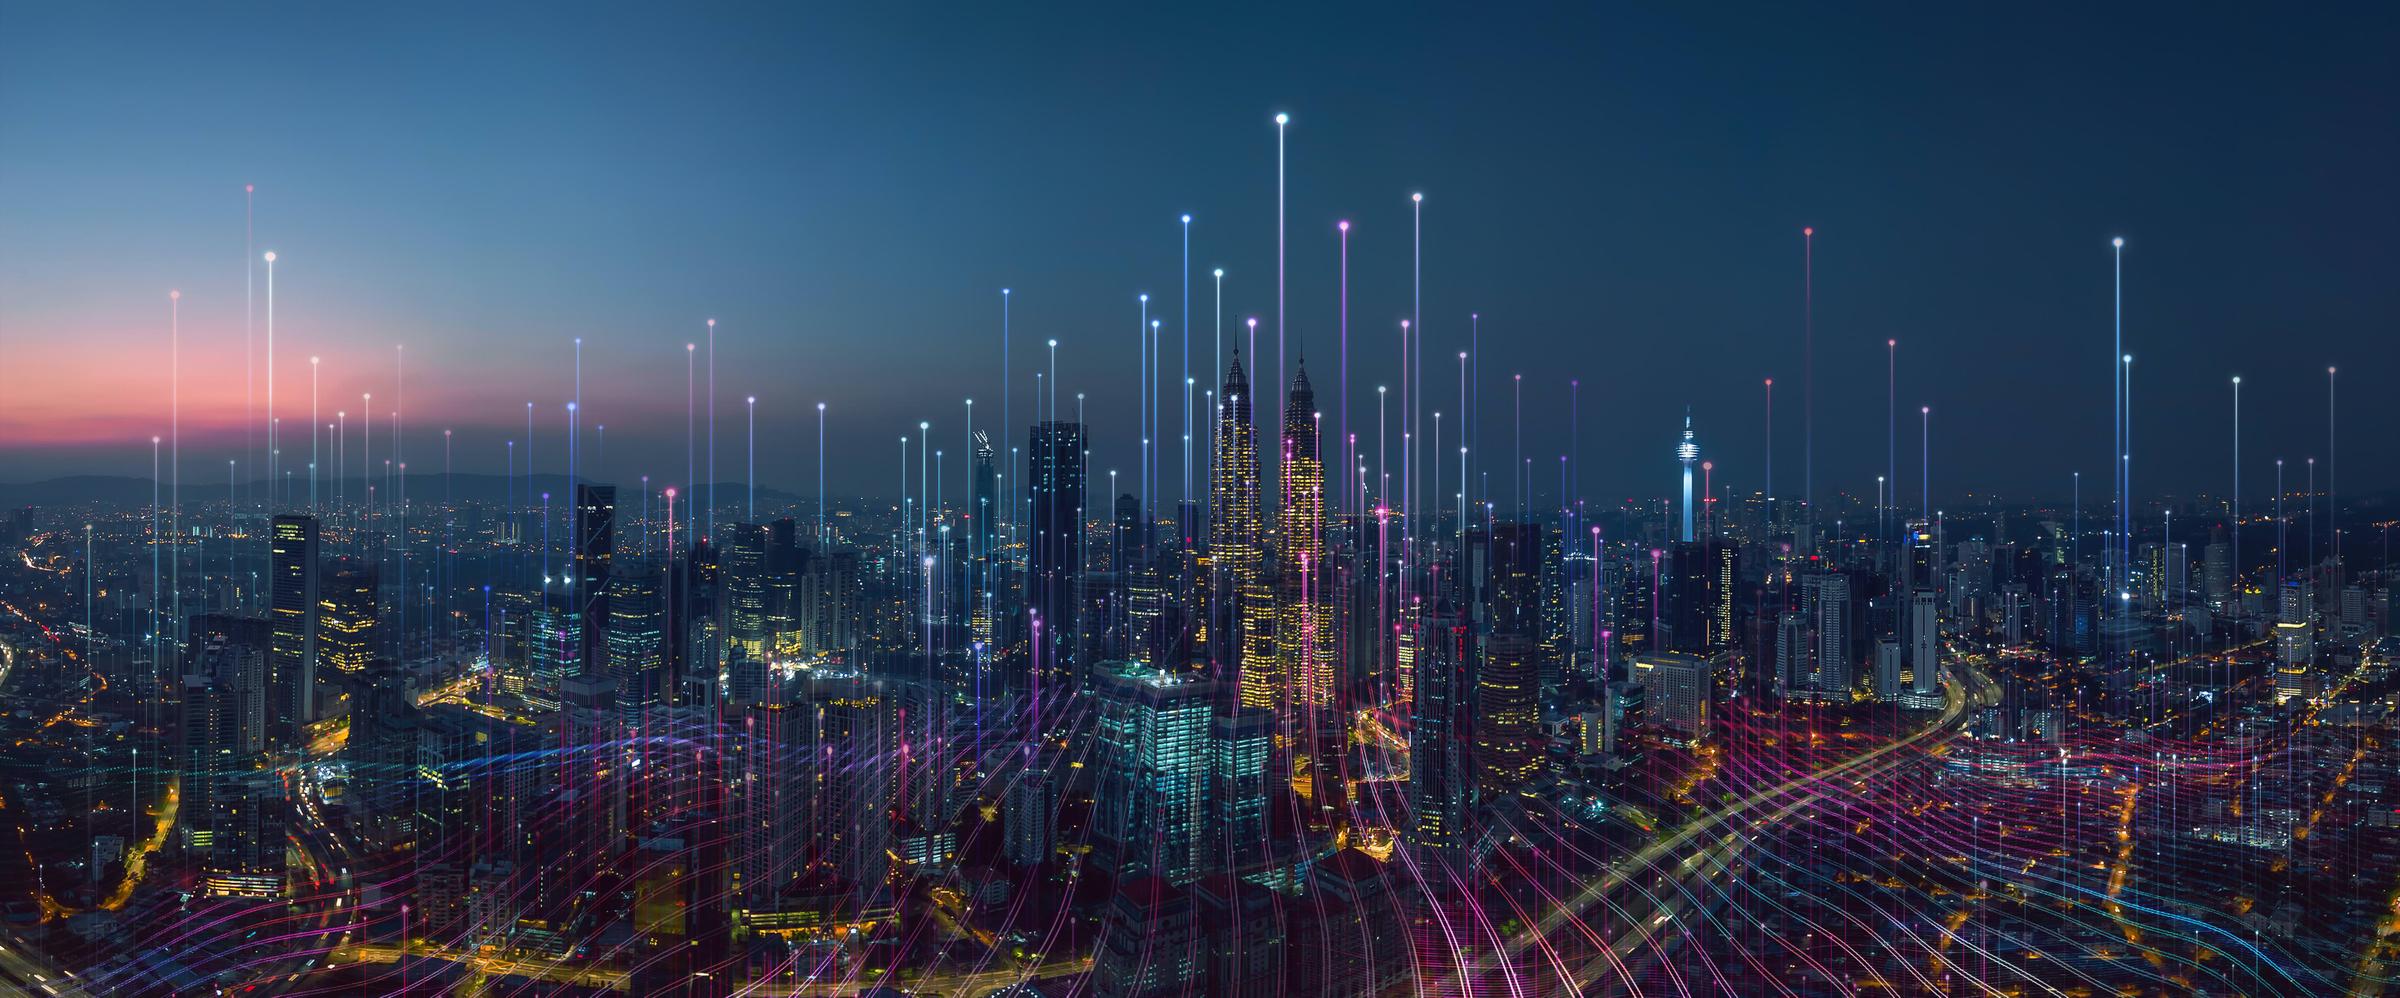 Accruent - Solutions - IoT Remote Monitoring  Solutions - Hero